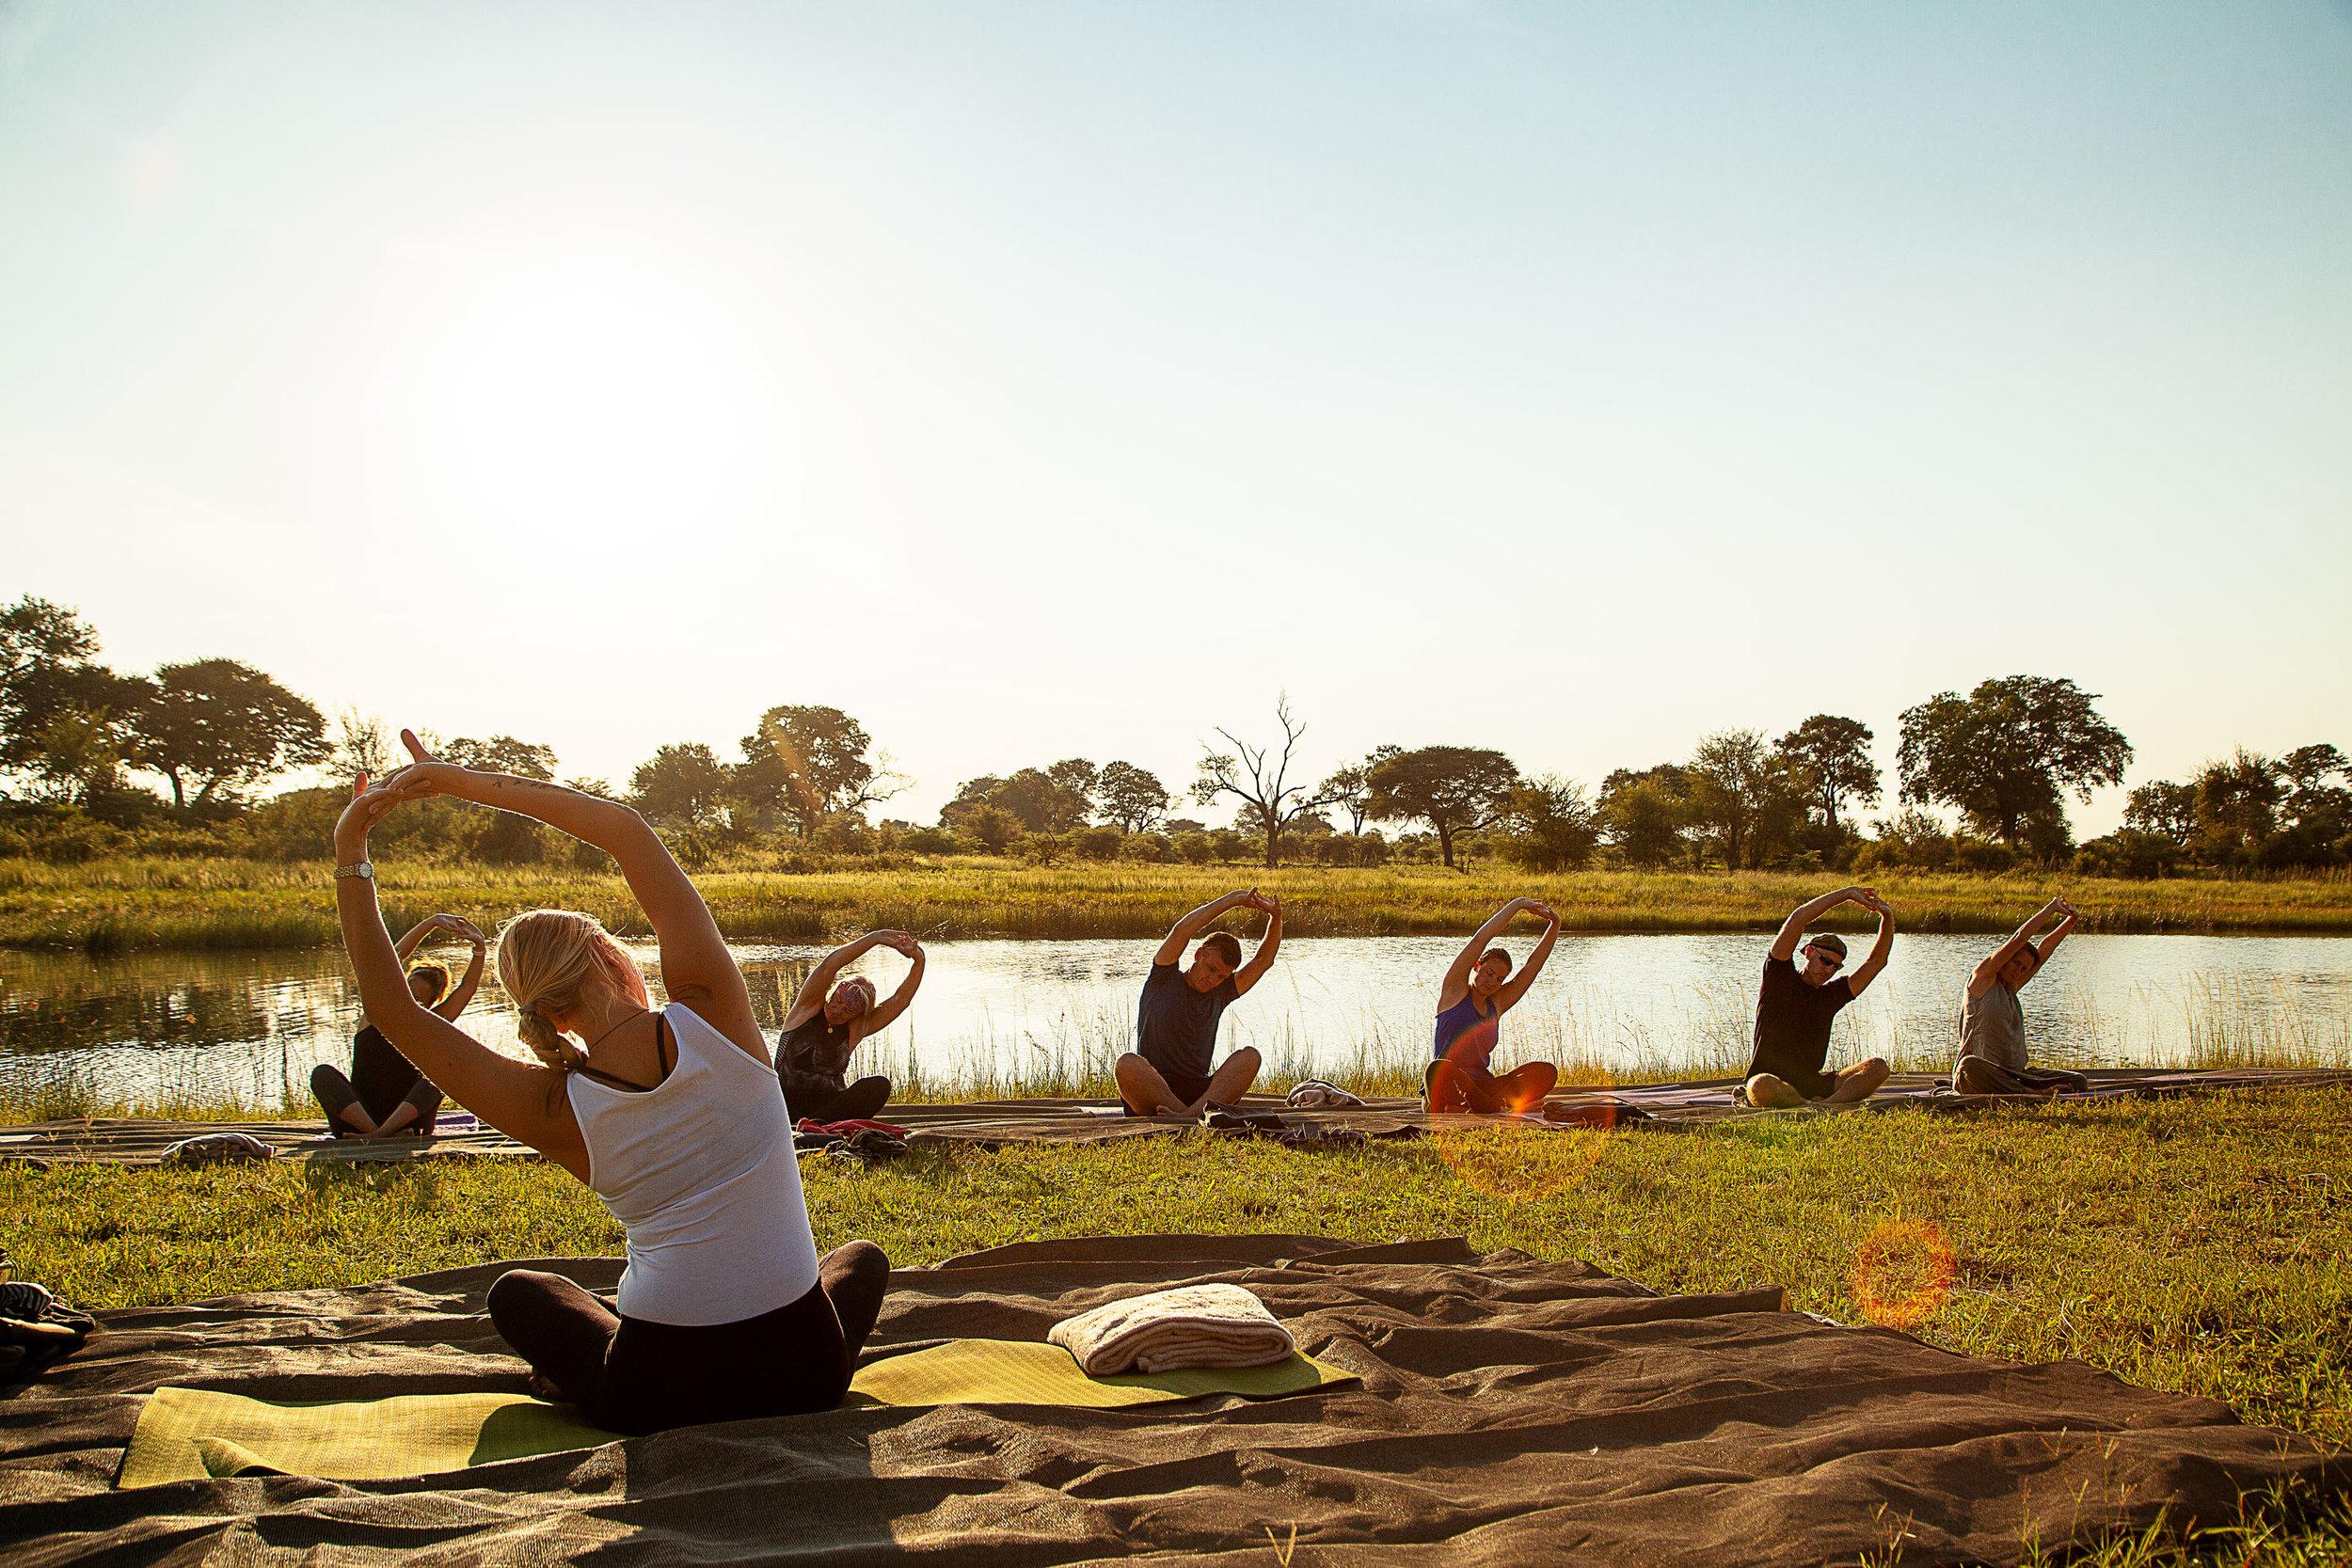 yoga retreat africa namaste yoga safari